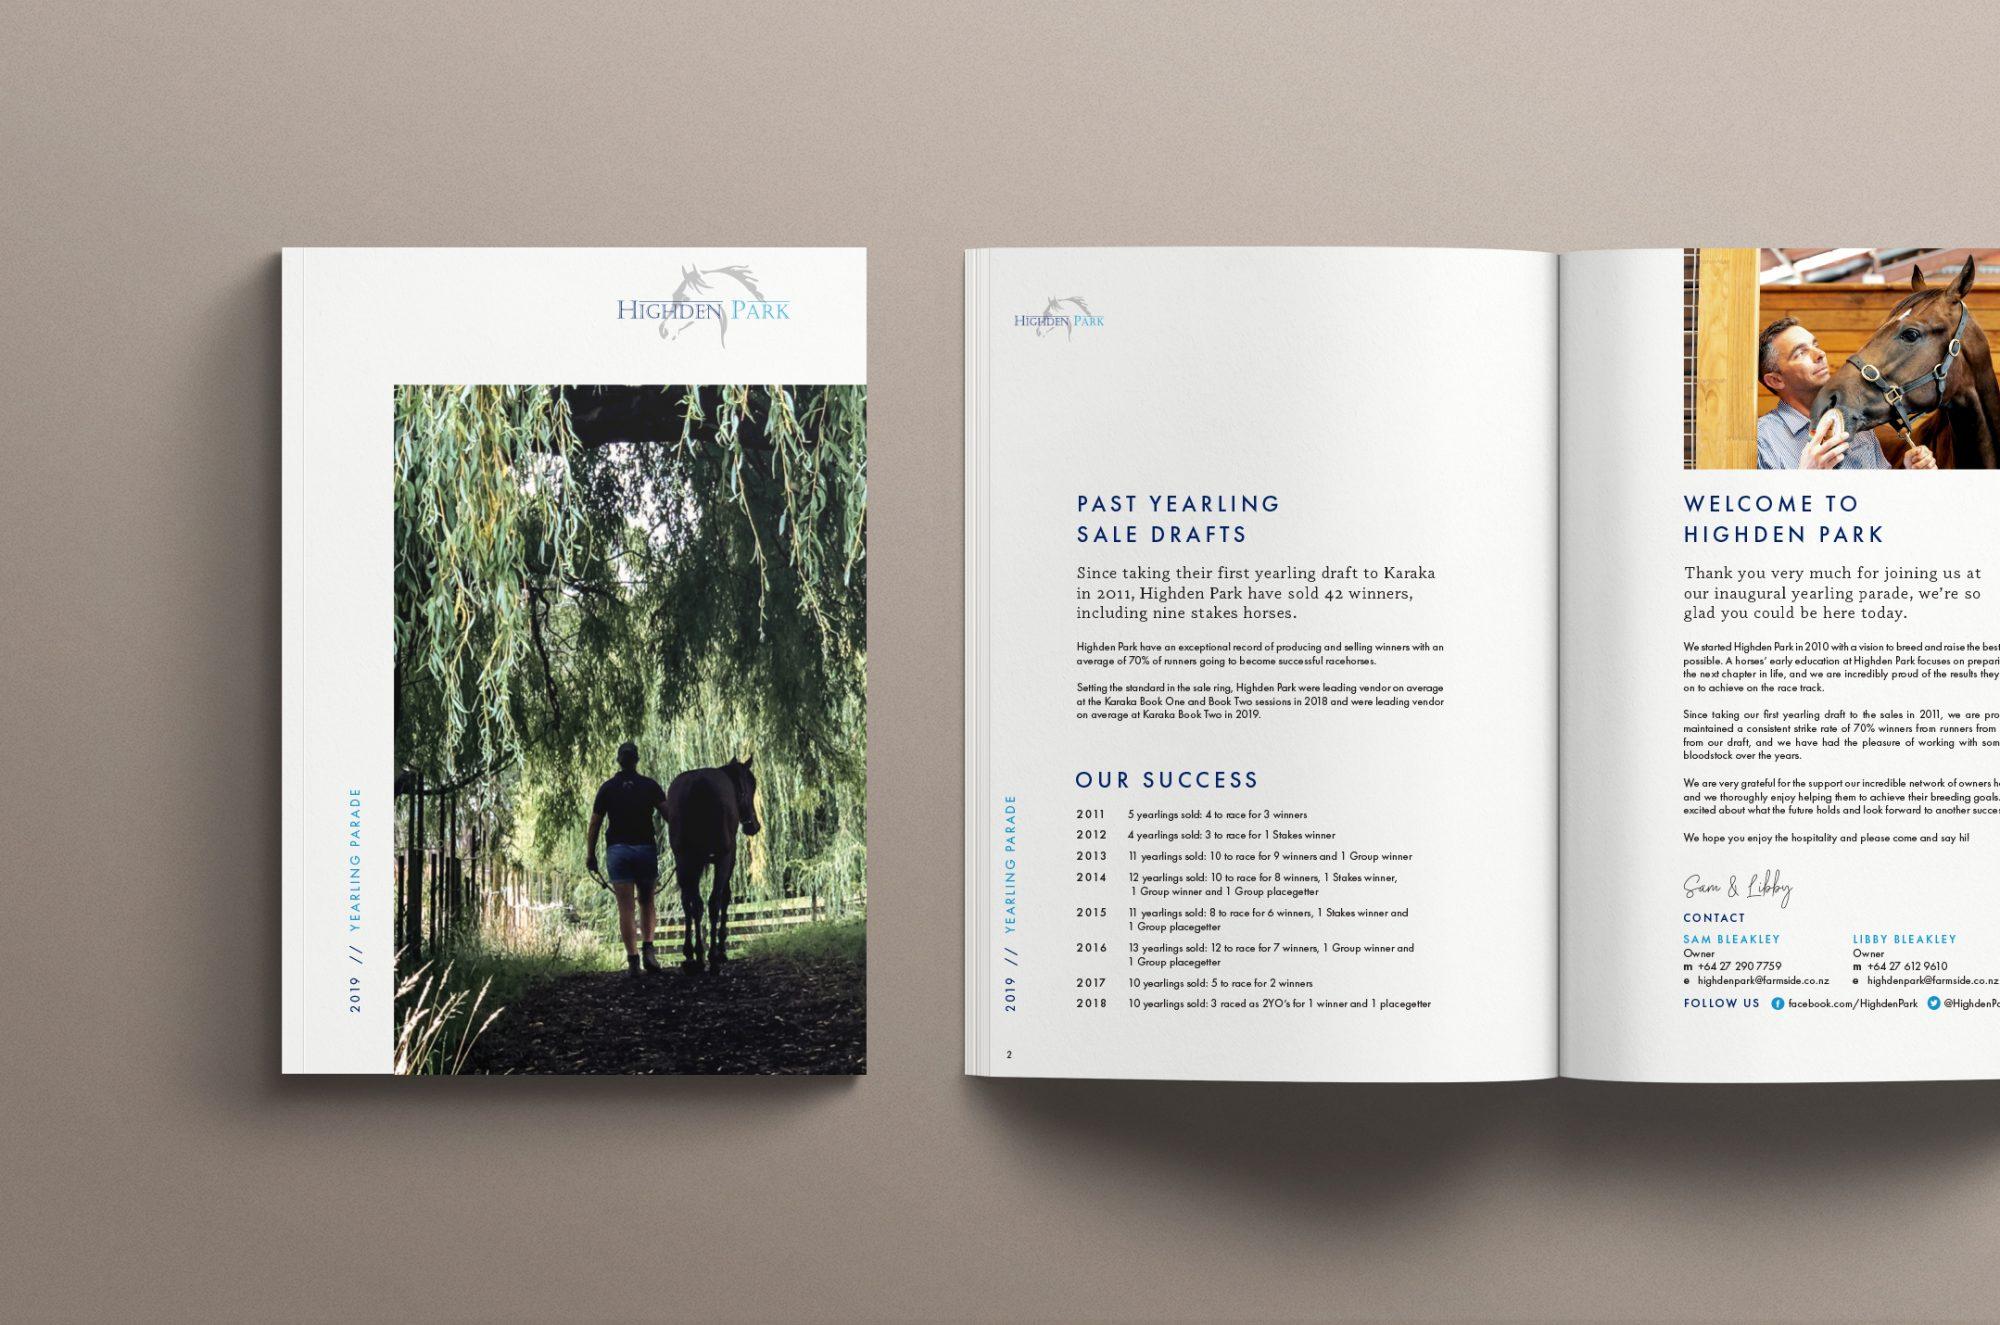 Highden_Park_Booklet_1-webv2